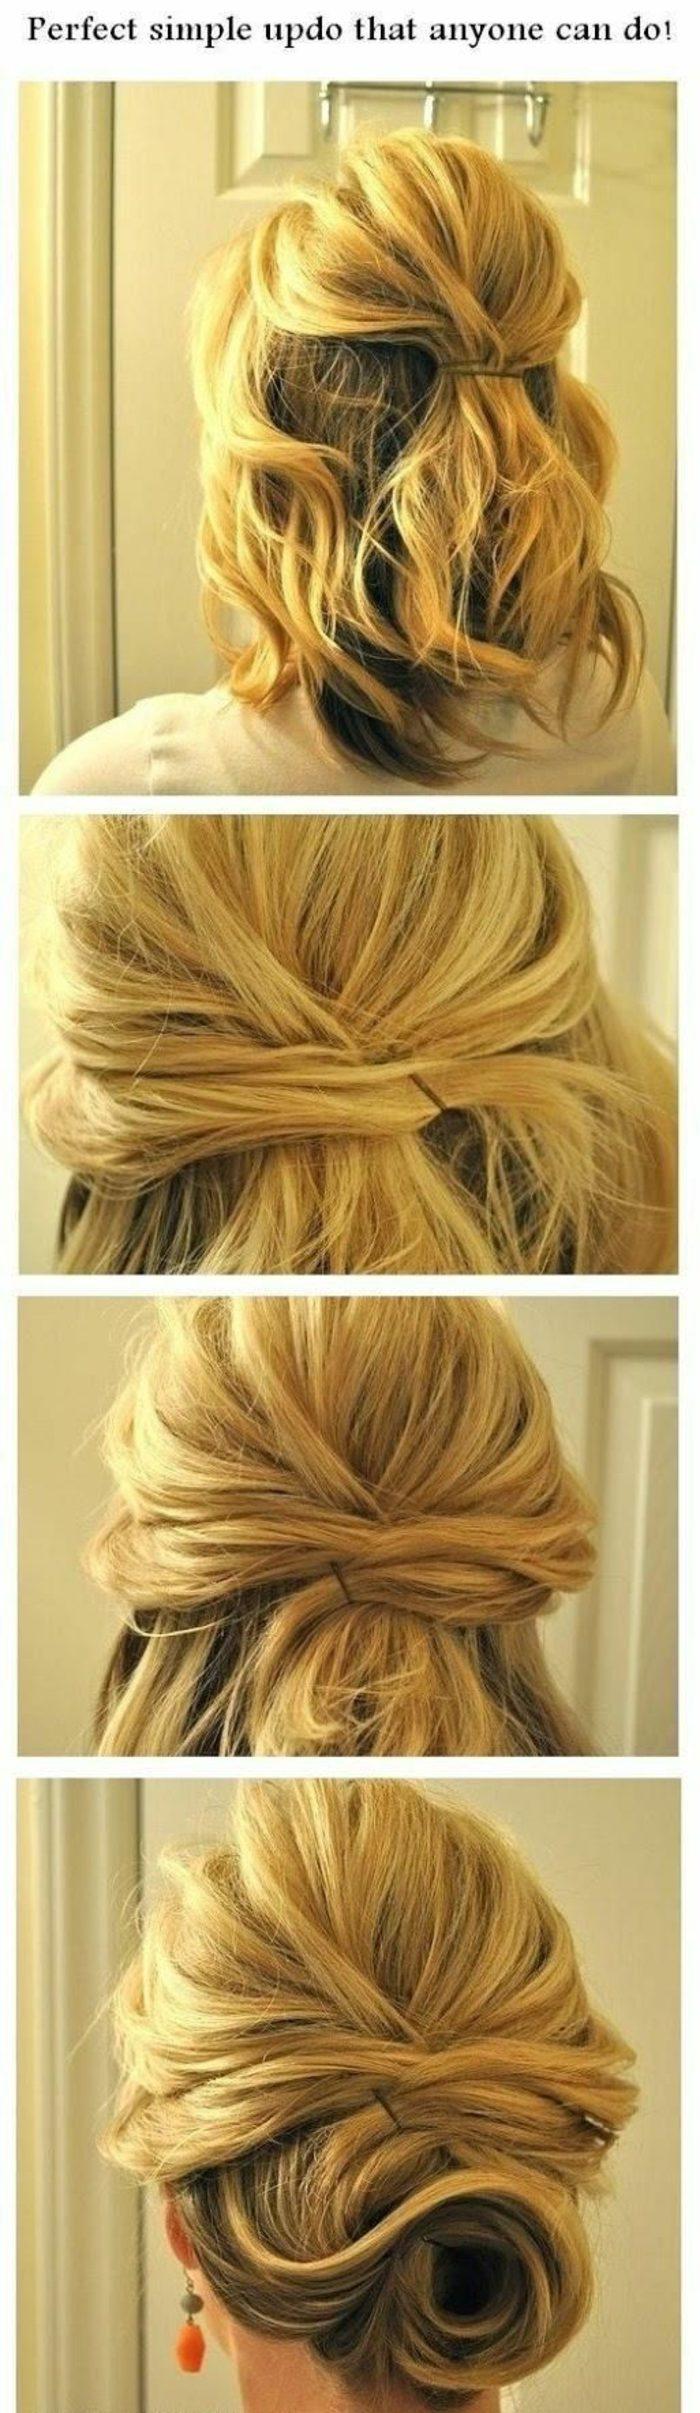 peinados-nochevieja-pelo-media-melena-rizado-rubio-recogido-fácil-de-hacer-paso-a-paso